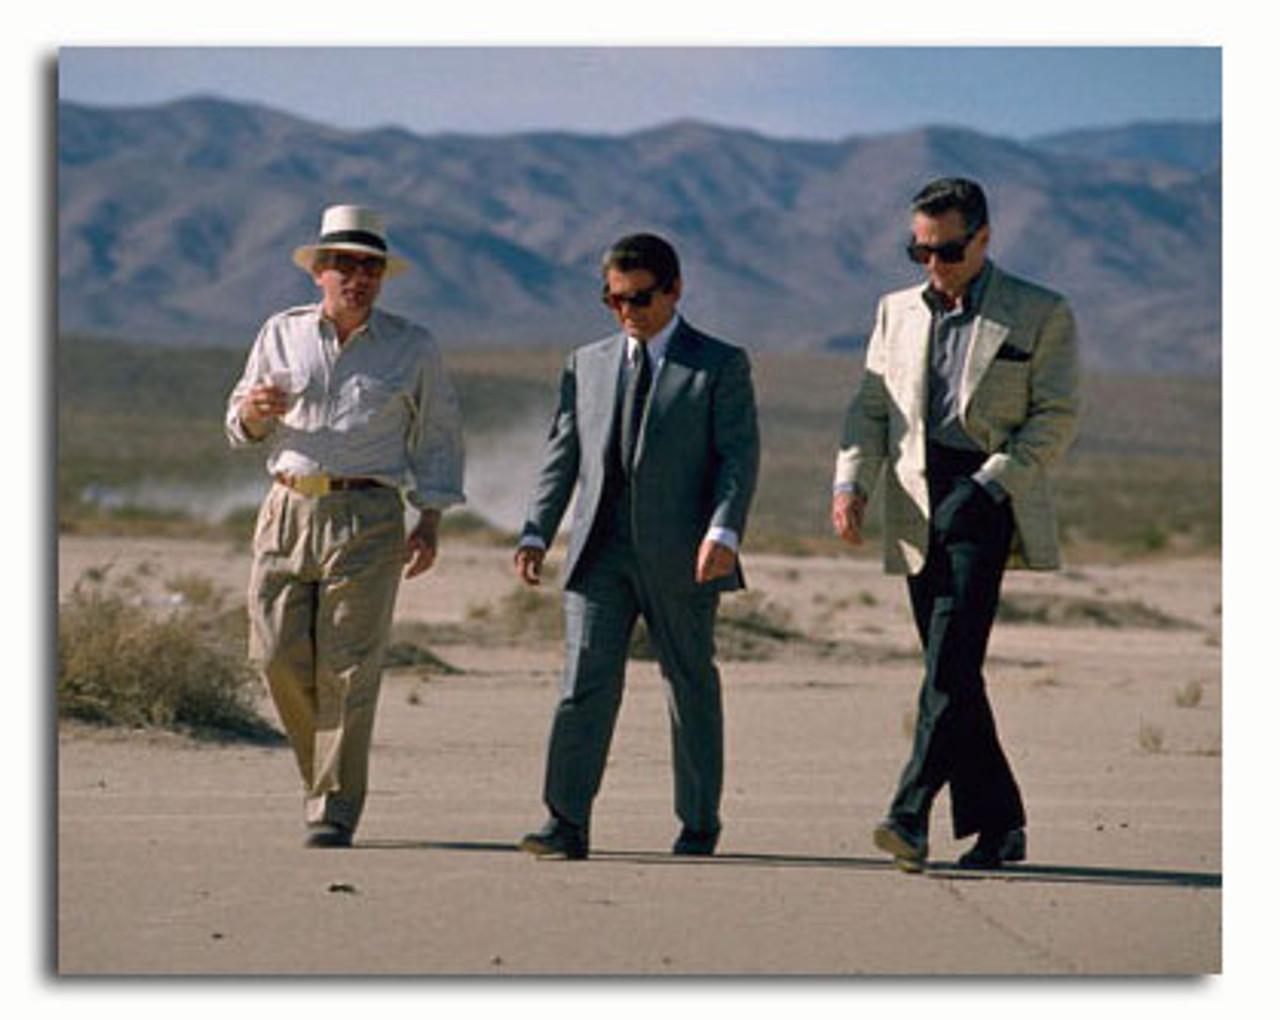 Casino movie to buy penn national columbus casino jobs